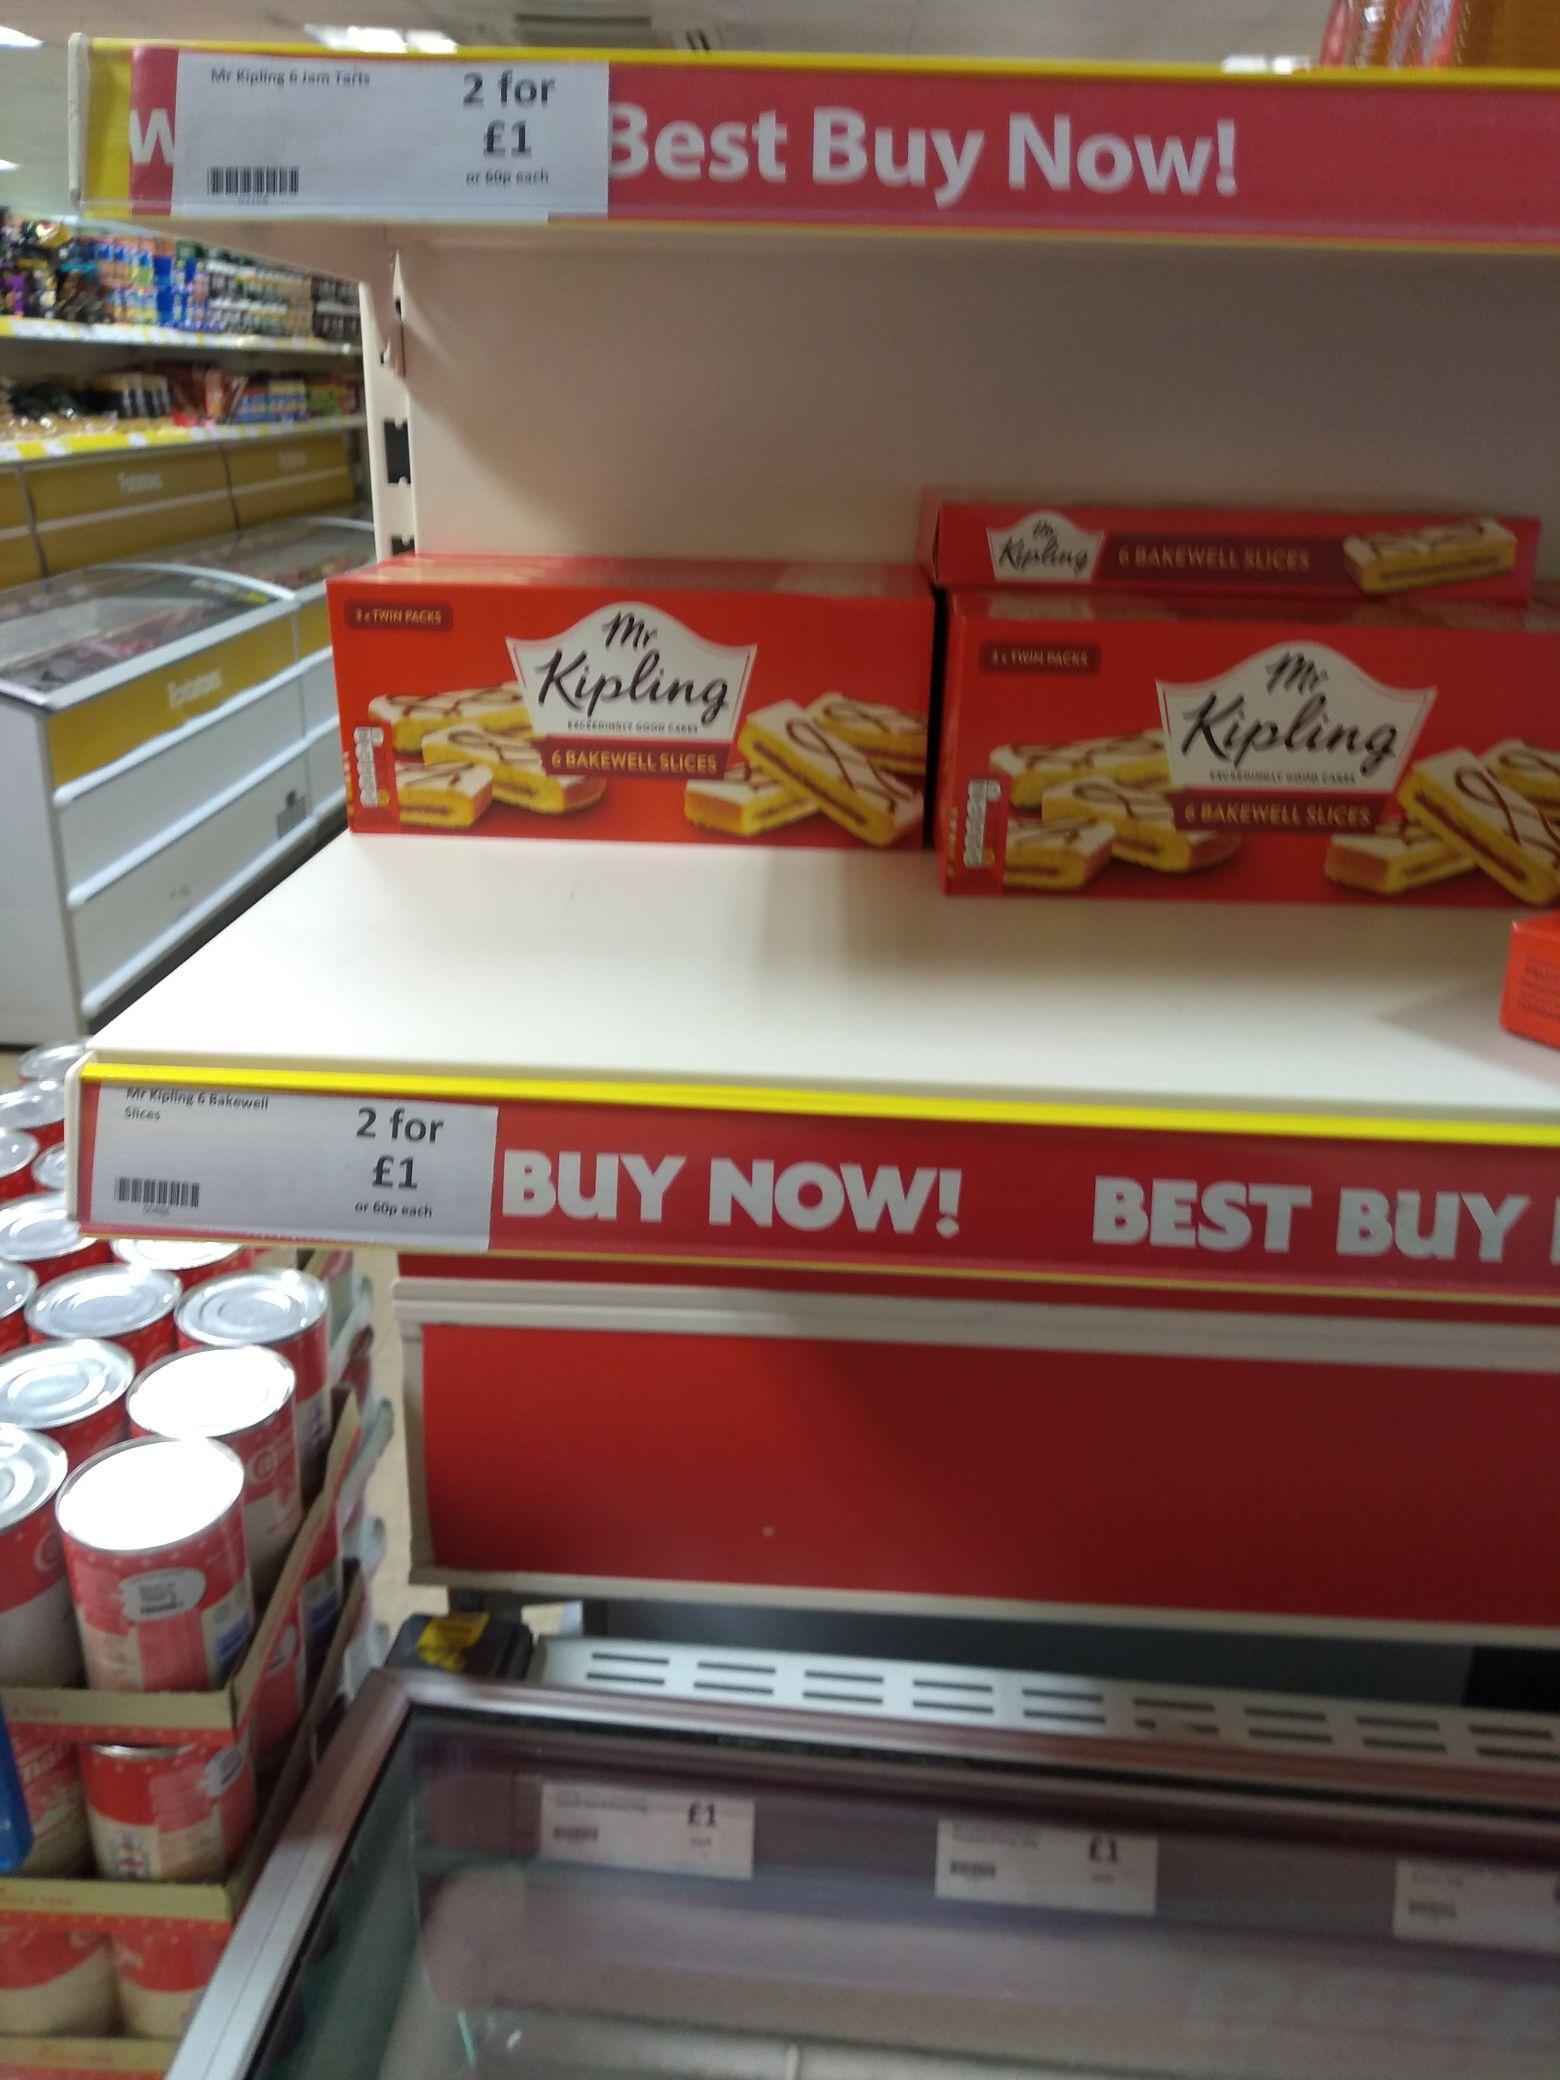 2 X 6 packs of Mr Kipling's Bakewell slices £1 instore @ Heron